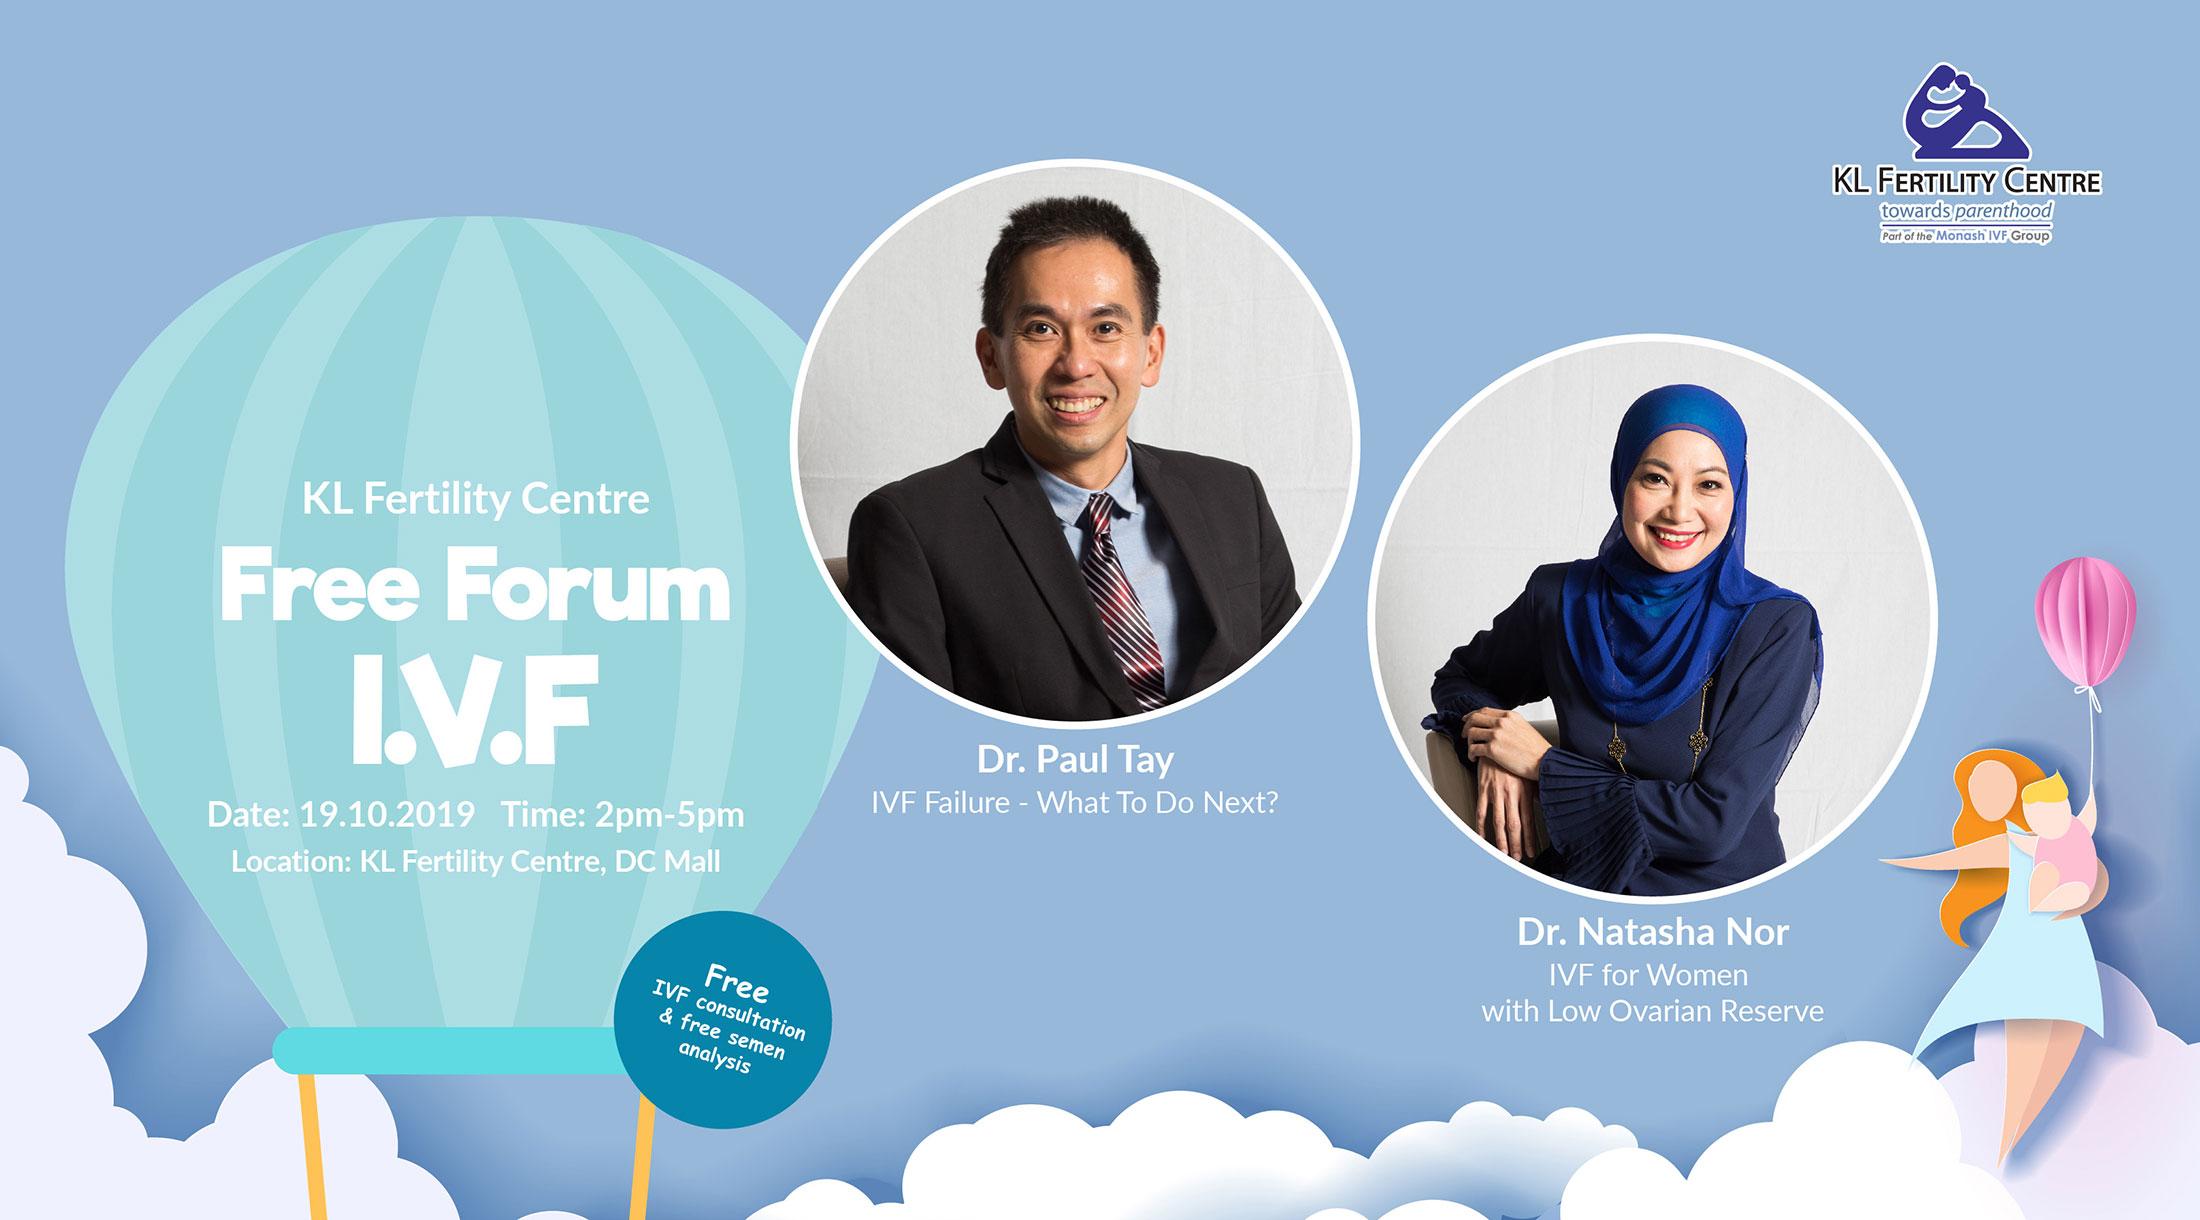 Free Forum IVF 19 October 2019 - Dr. Paul Tay & Dr. Natasha Nor